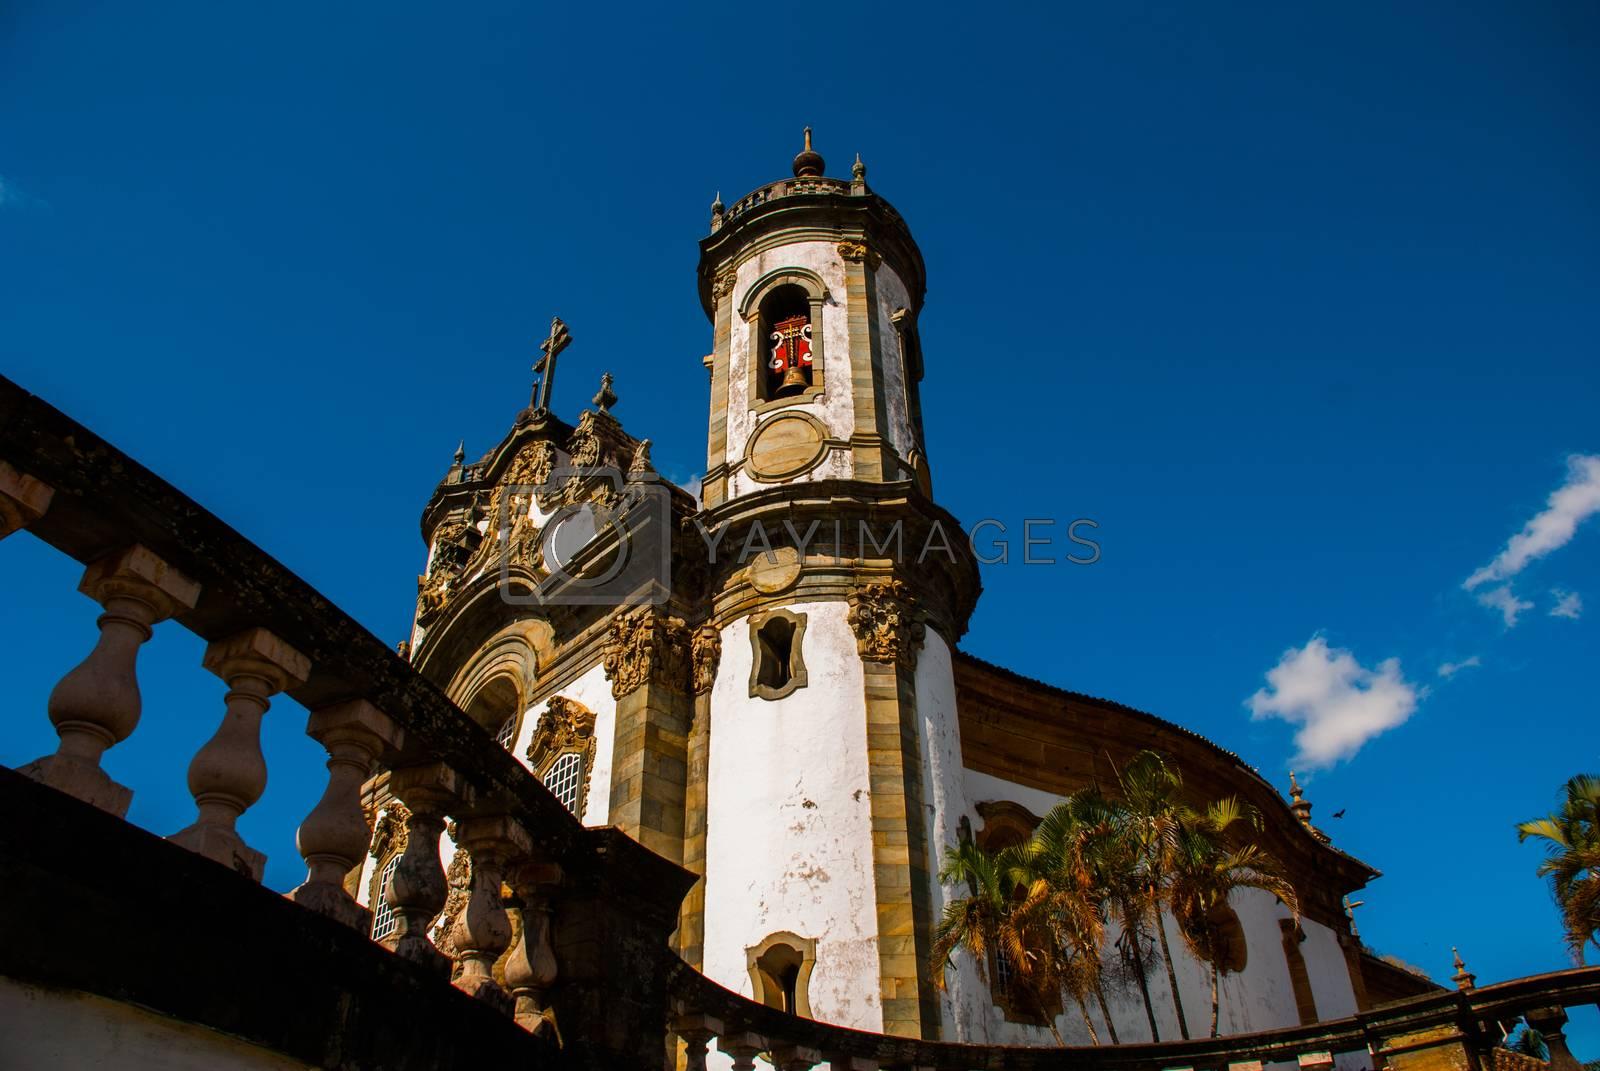 Sao Joao del Rei, Minas Gerais, Brazil: Sao Francisco de Assis church, one of the main church of rural colonial town of Sao Joao del Rei, the state of Minas Gerais